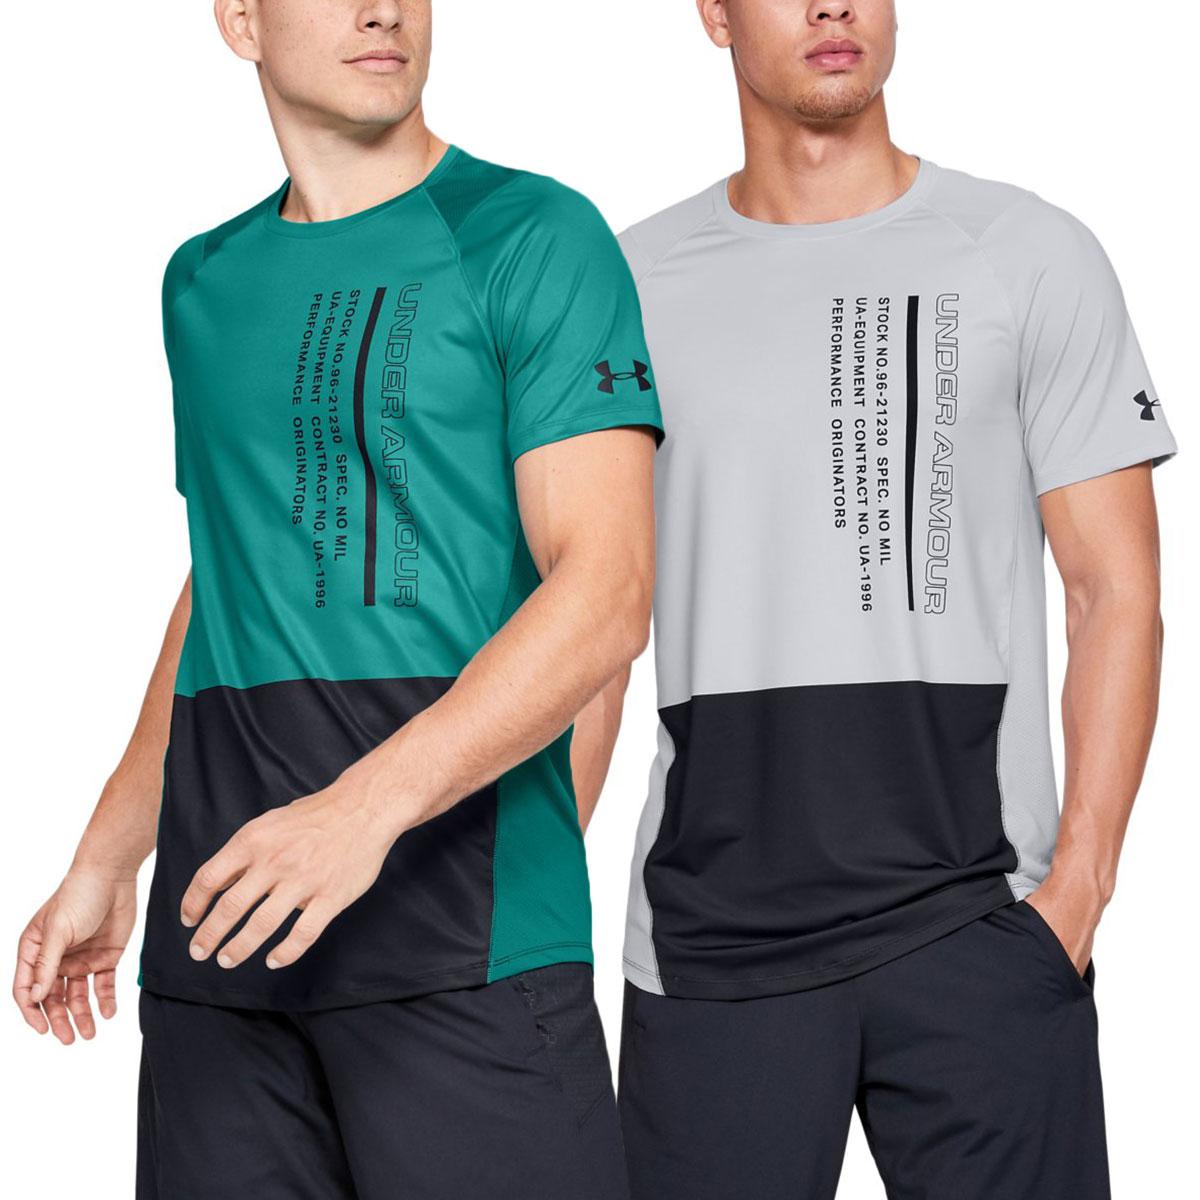 7a5224e798 Details about Under Armour Mens 2019 Mk1 Short Sleeve Colorblock Wicking  HeatGear T-Shirt